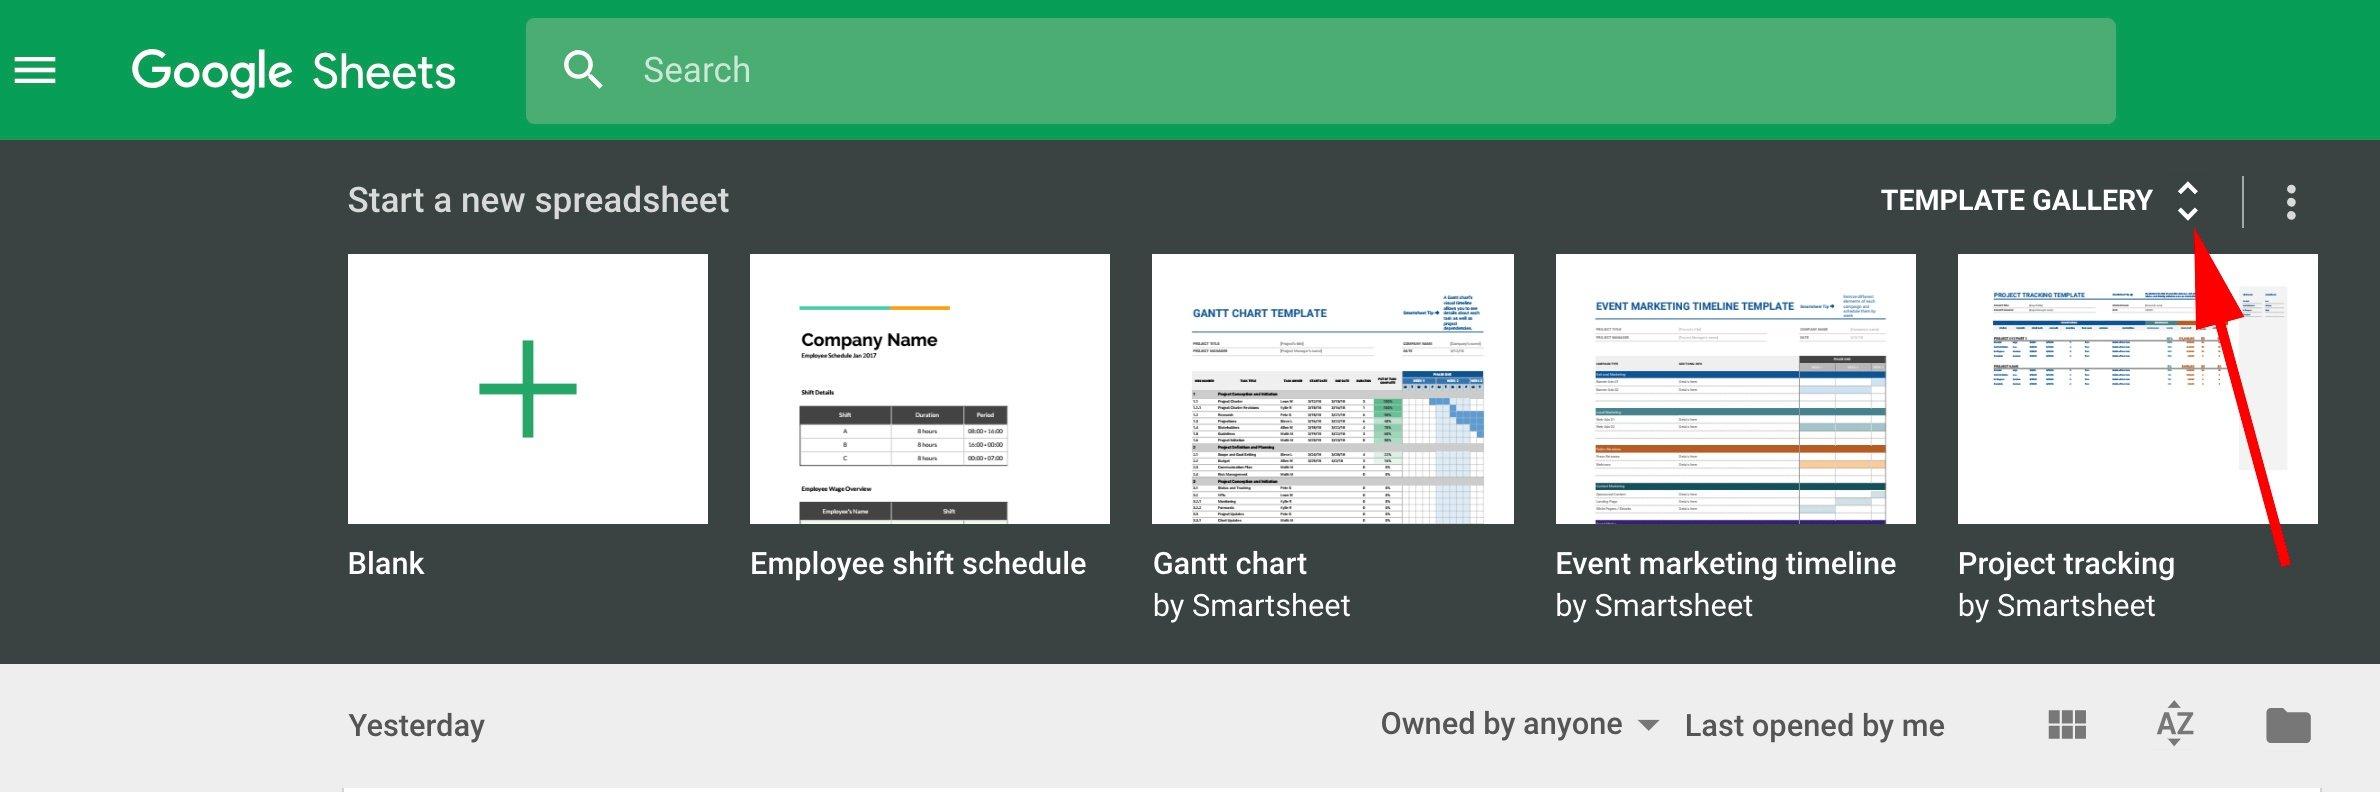 google-sheets-1-1.jpg